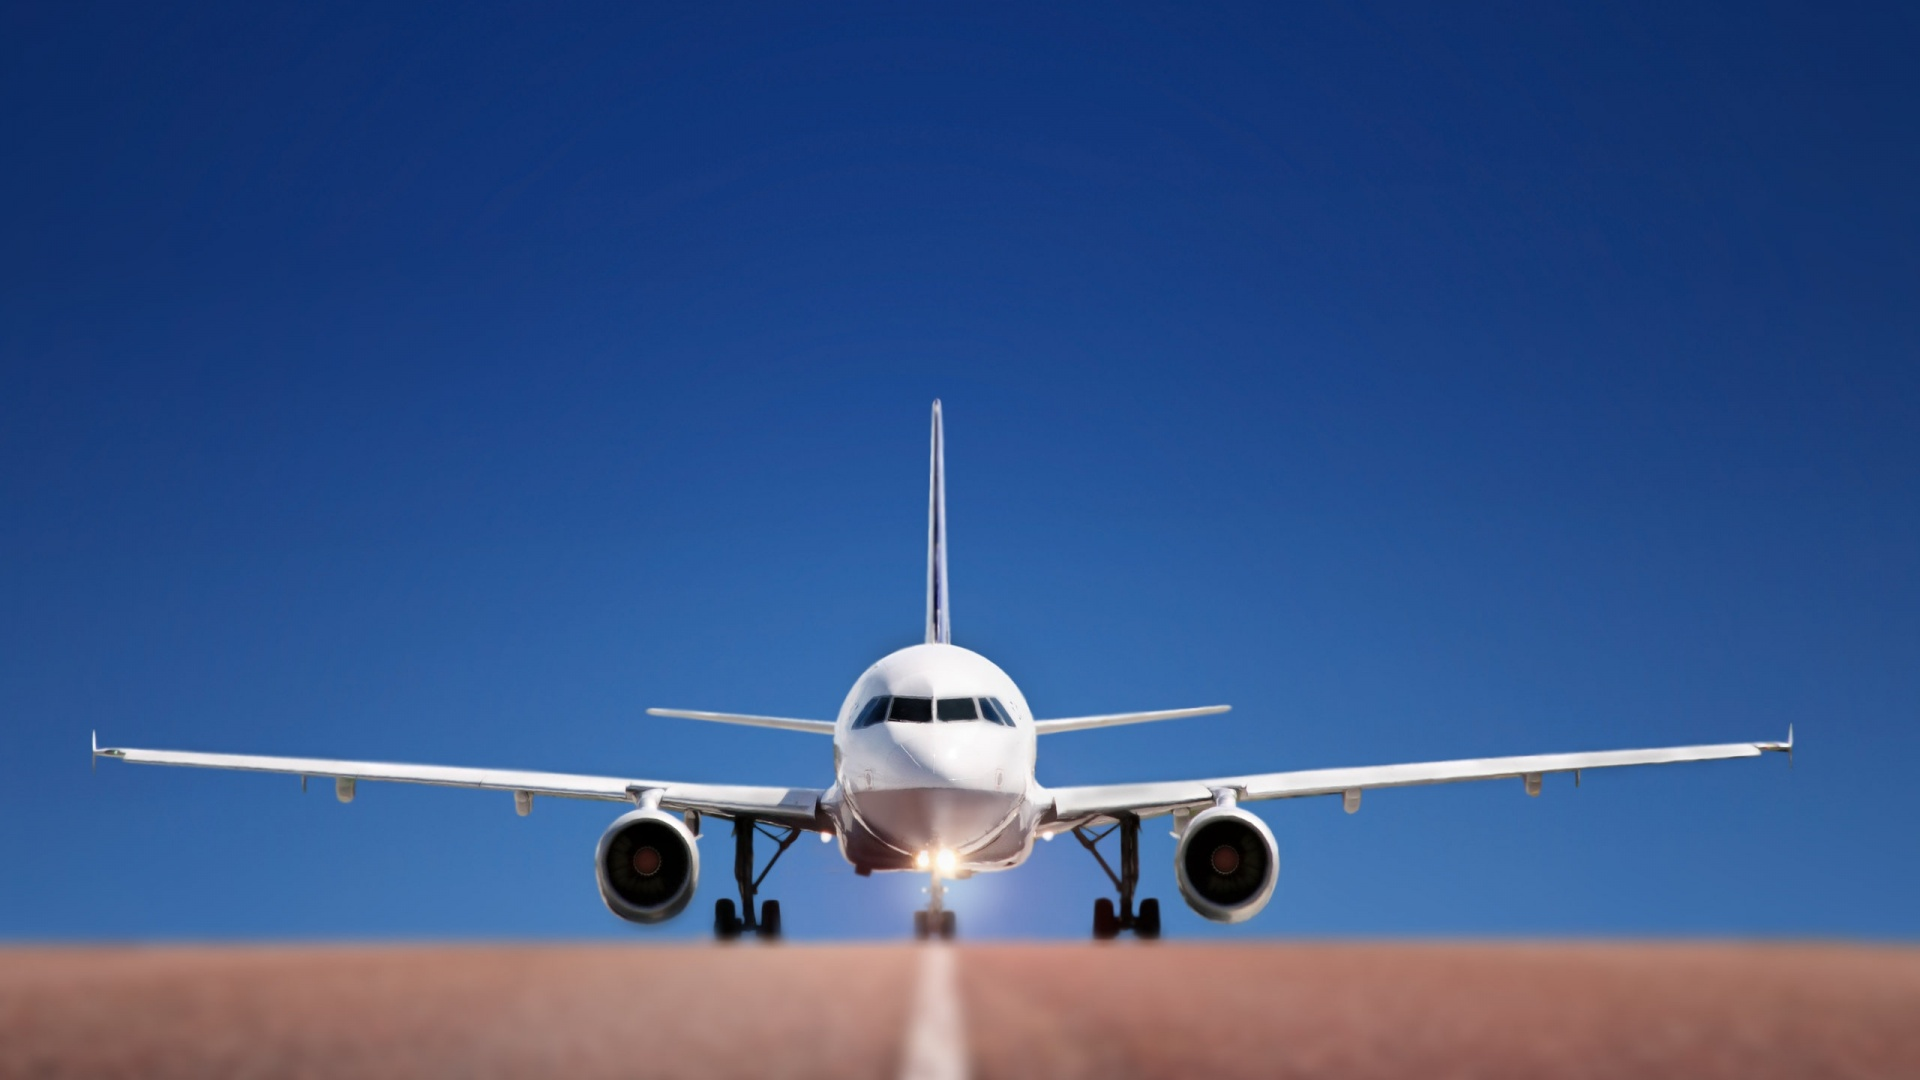 Take Off Airplane 1920 x 1080 Download Close 1920x1080